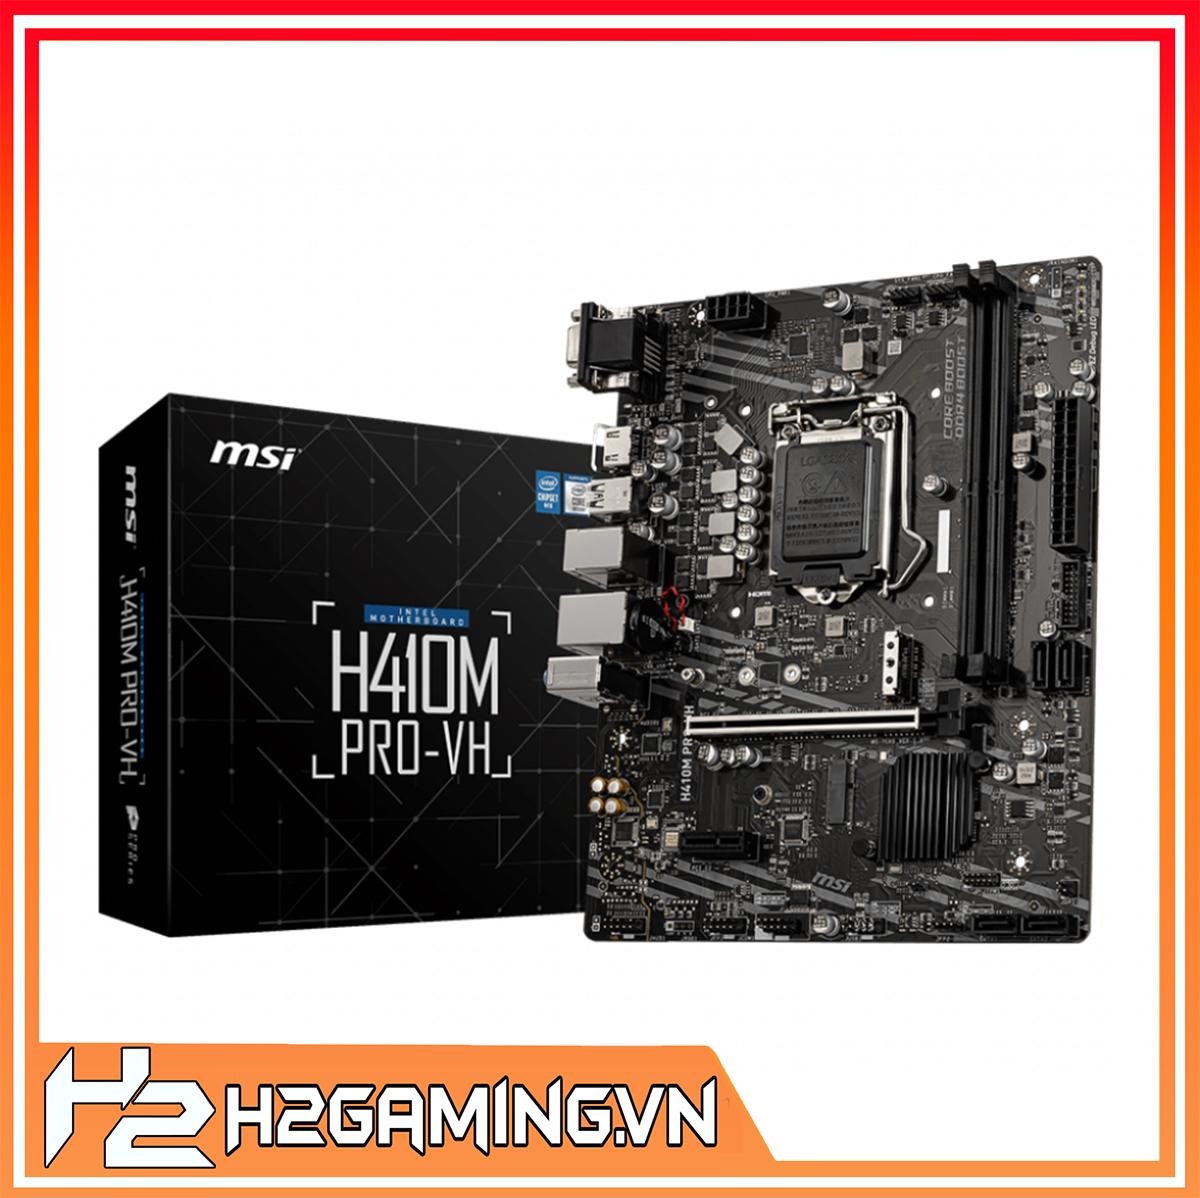 MSI_H410M_PRO-VH